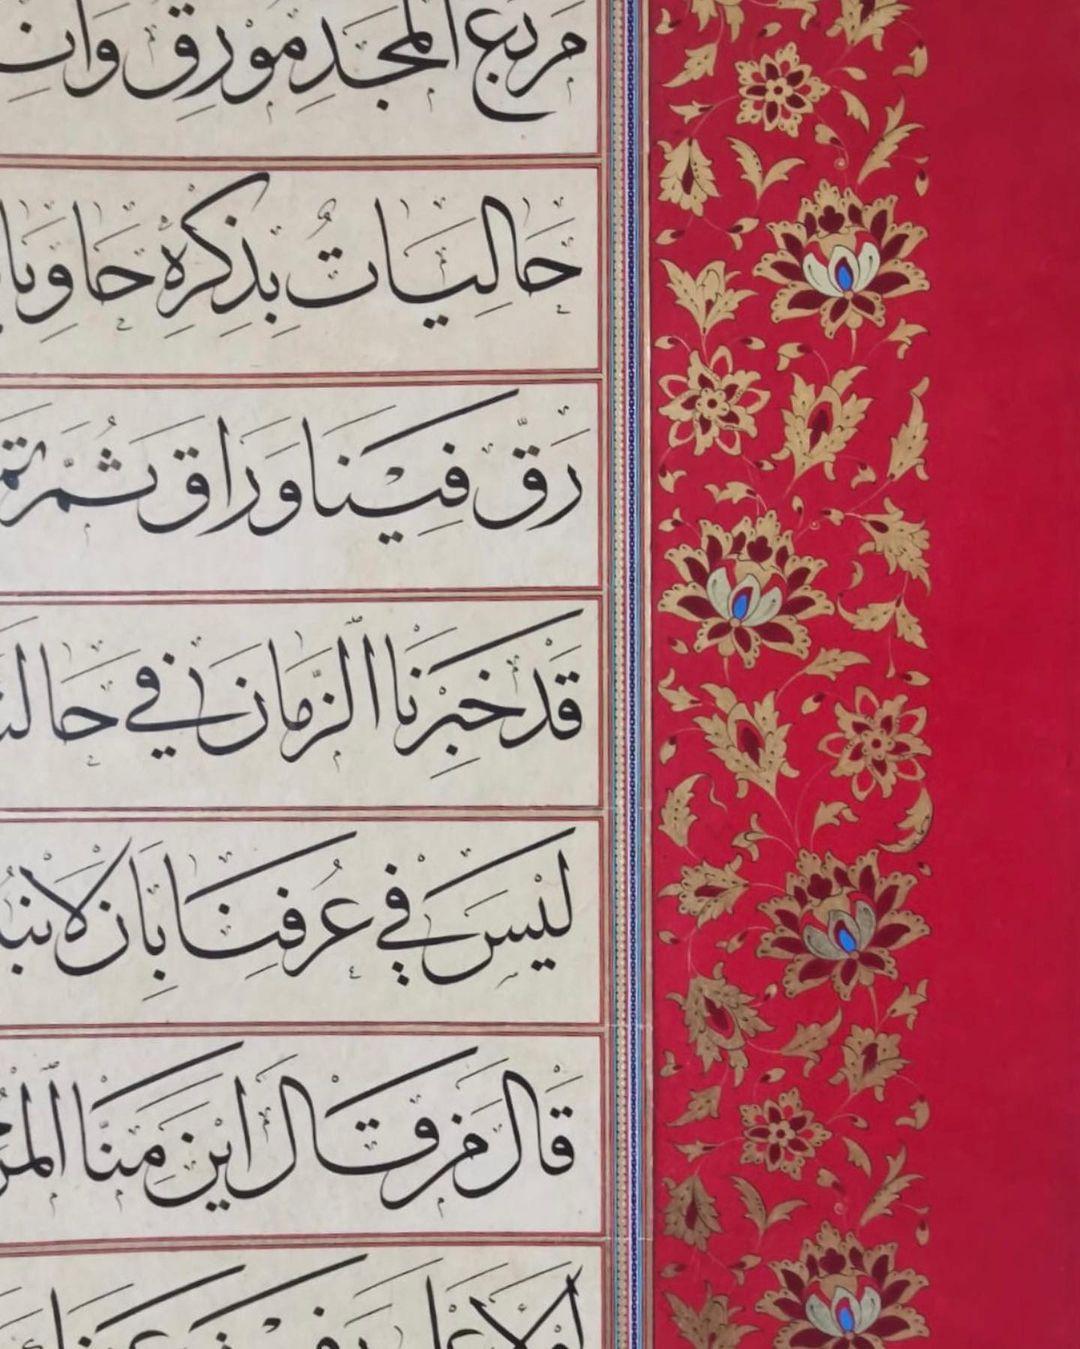 Professional Calligrapher Bijar Arbilly Calligraphy  اجزاء من عملي… قصيدة للشيخ محمد بن راشد آل مكتوم #calligraphy #kunst #art #tehra... 339 3